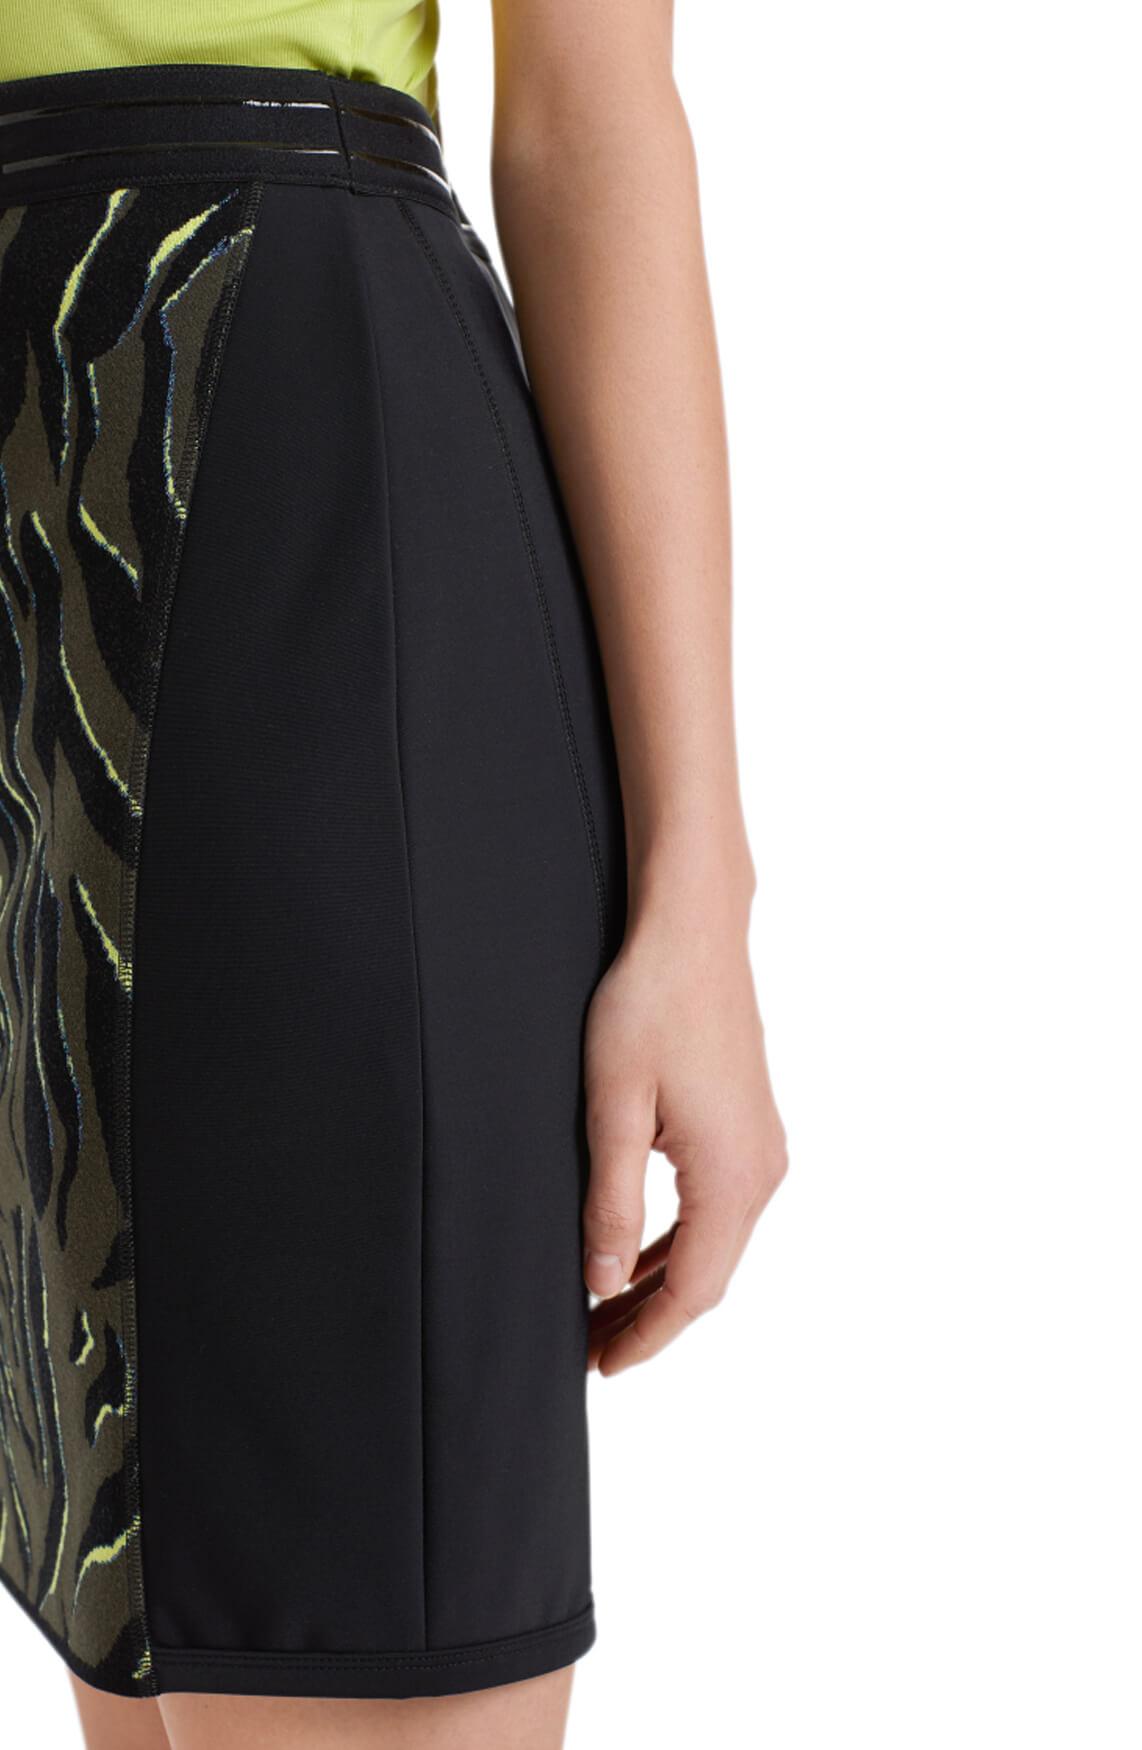 Marccain Sports Dames Jacquard rok zwart